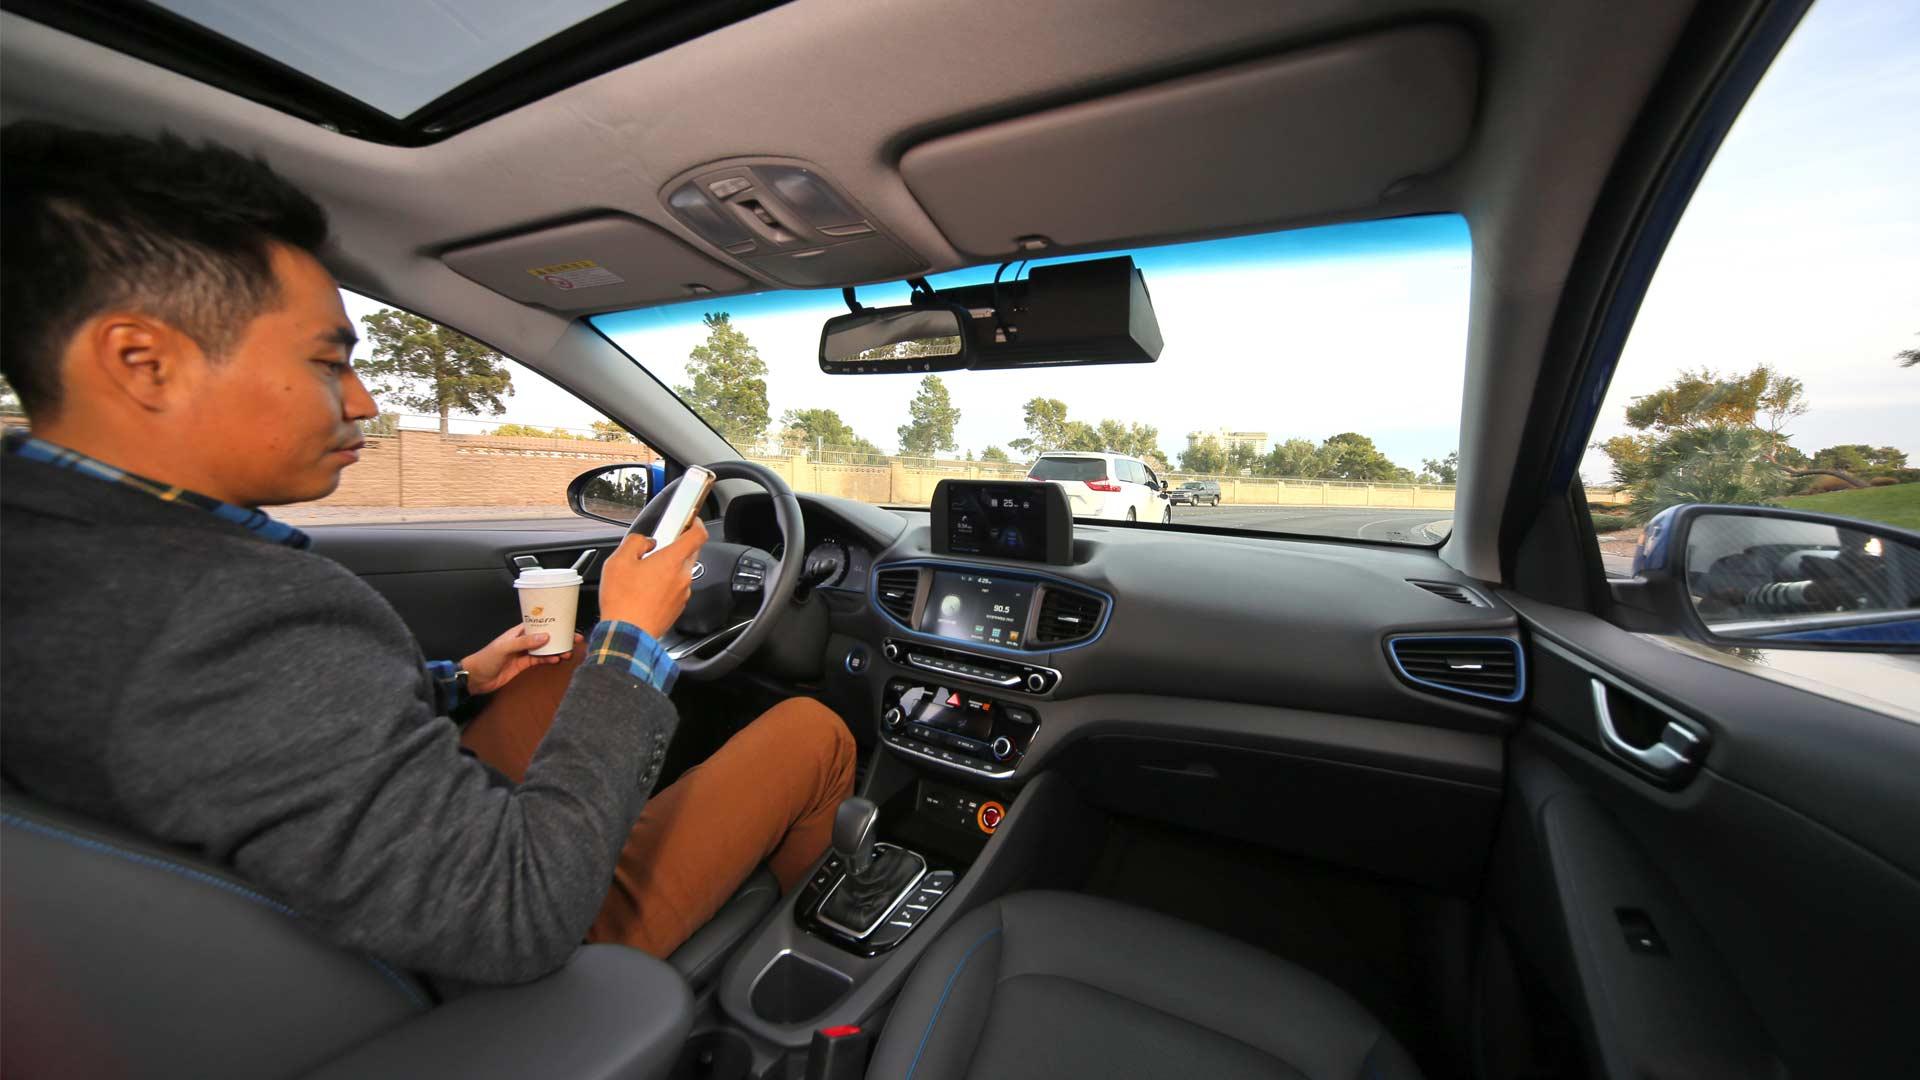 Hyundai-Ioniq-autonomous-interior-2018